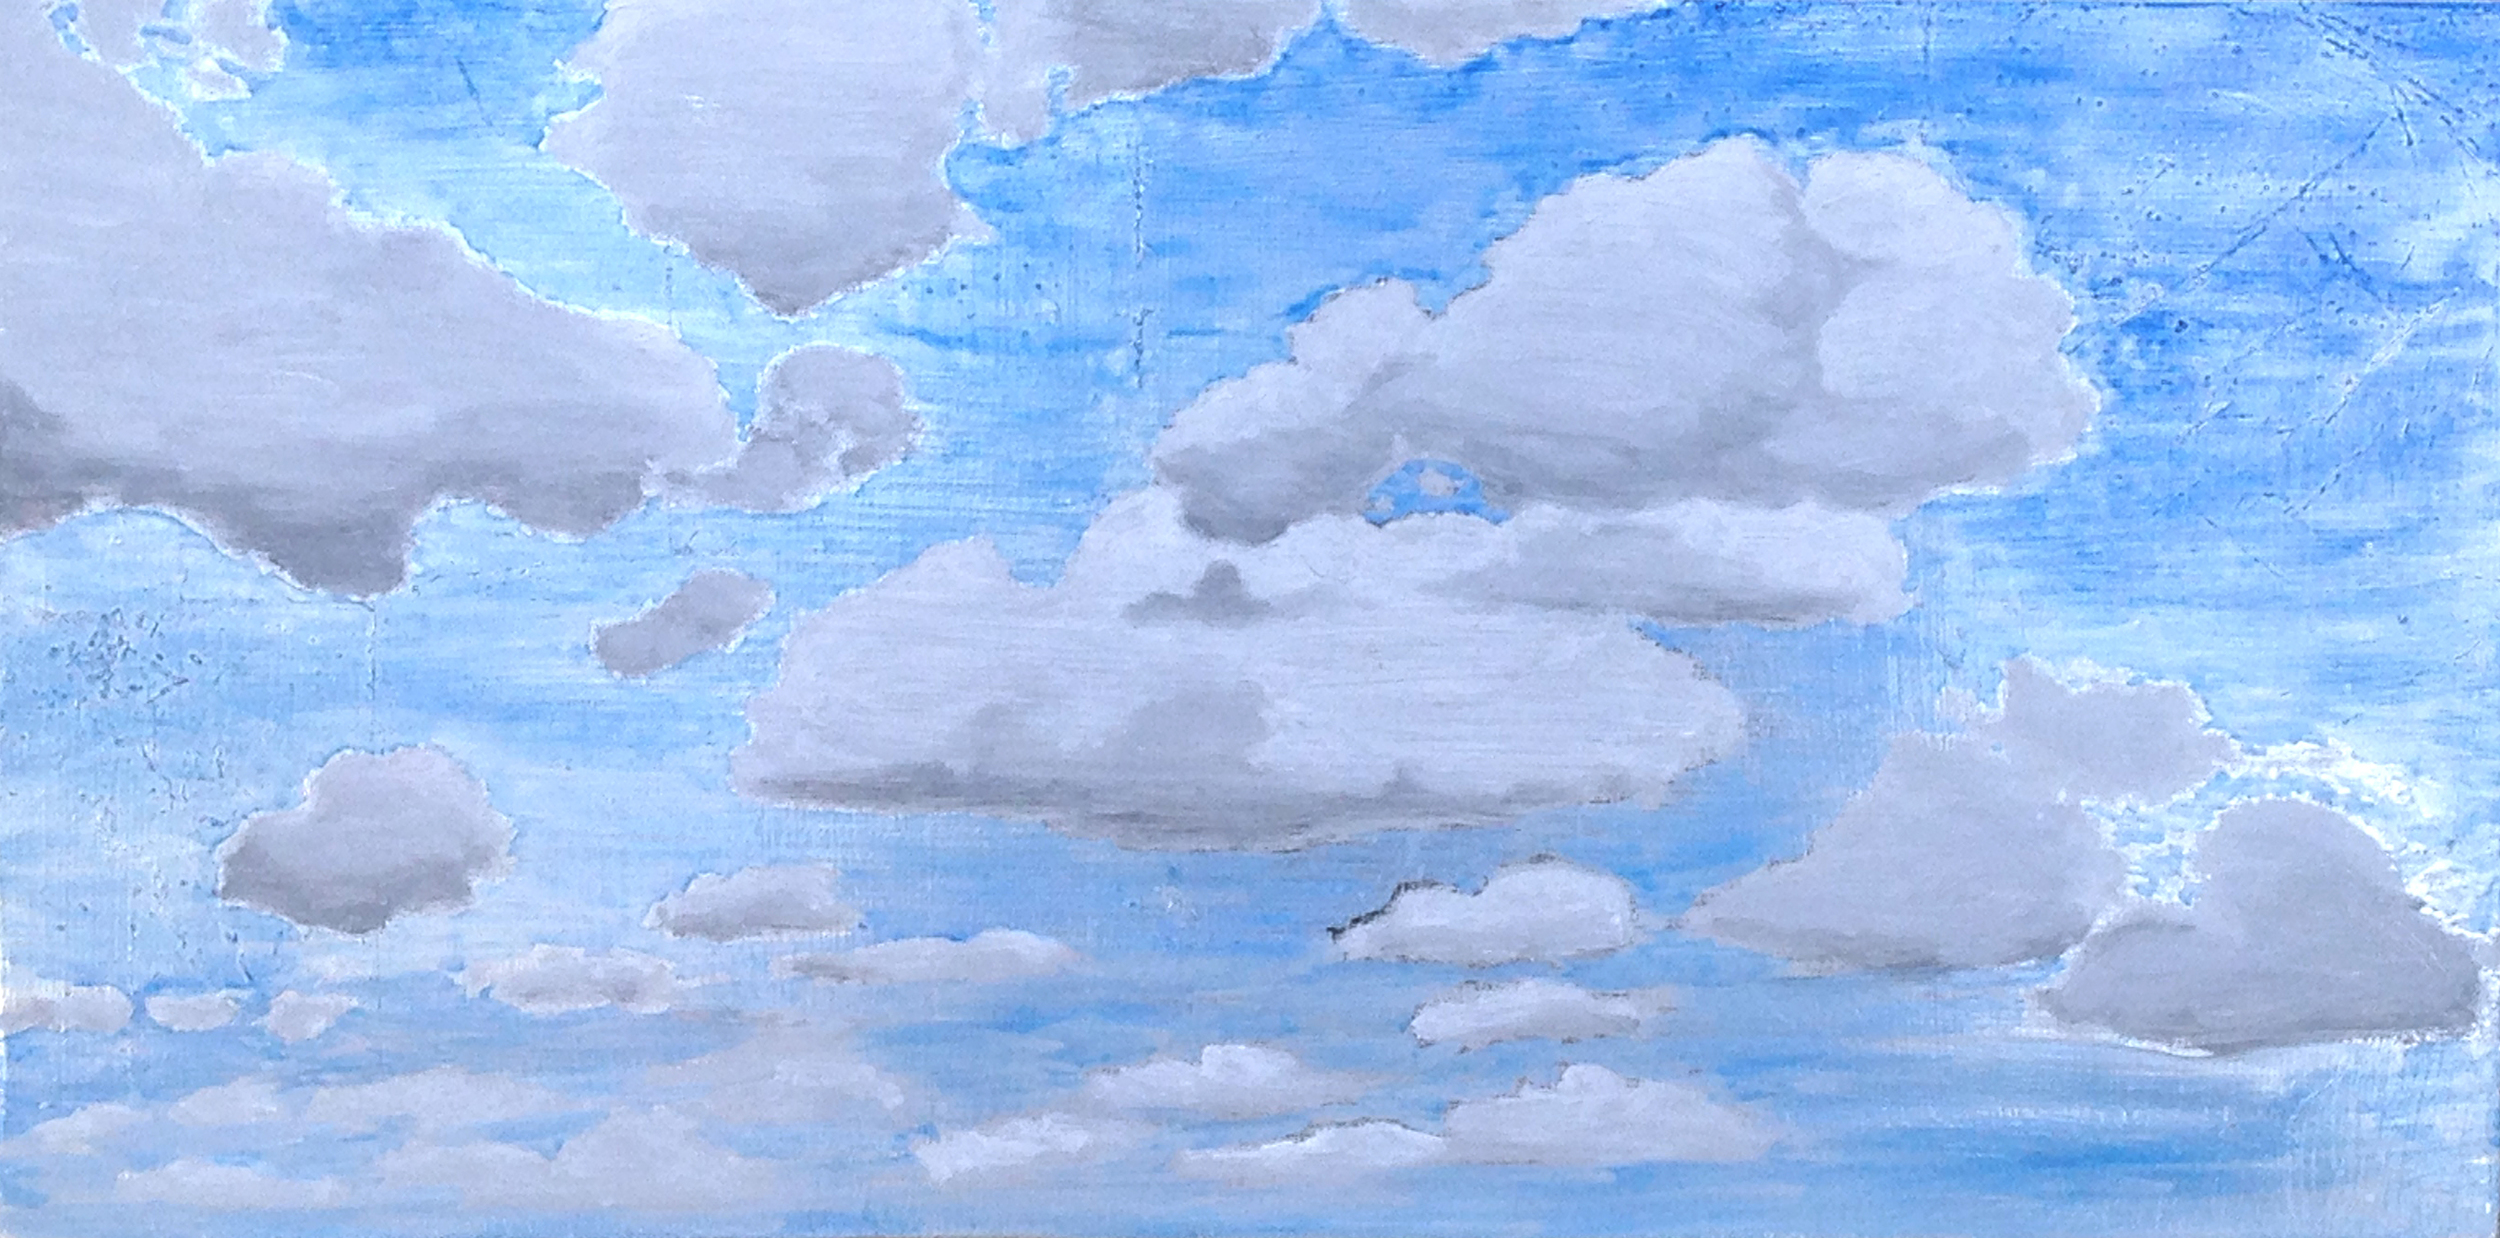 Cloud Study 1-10-14.jpg